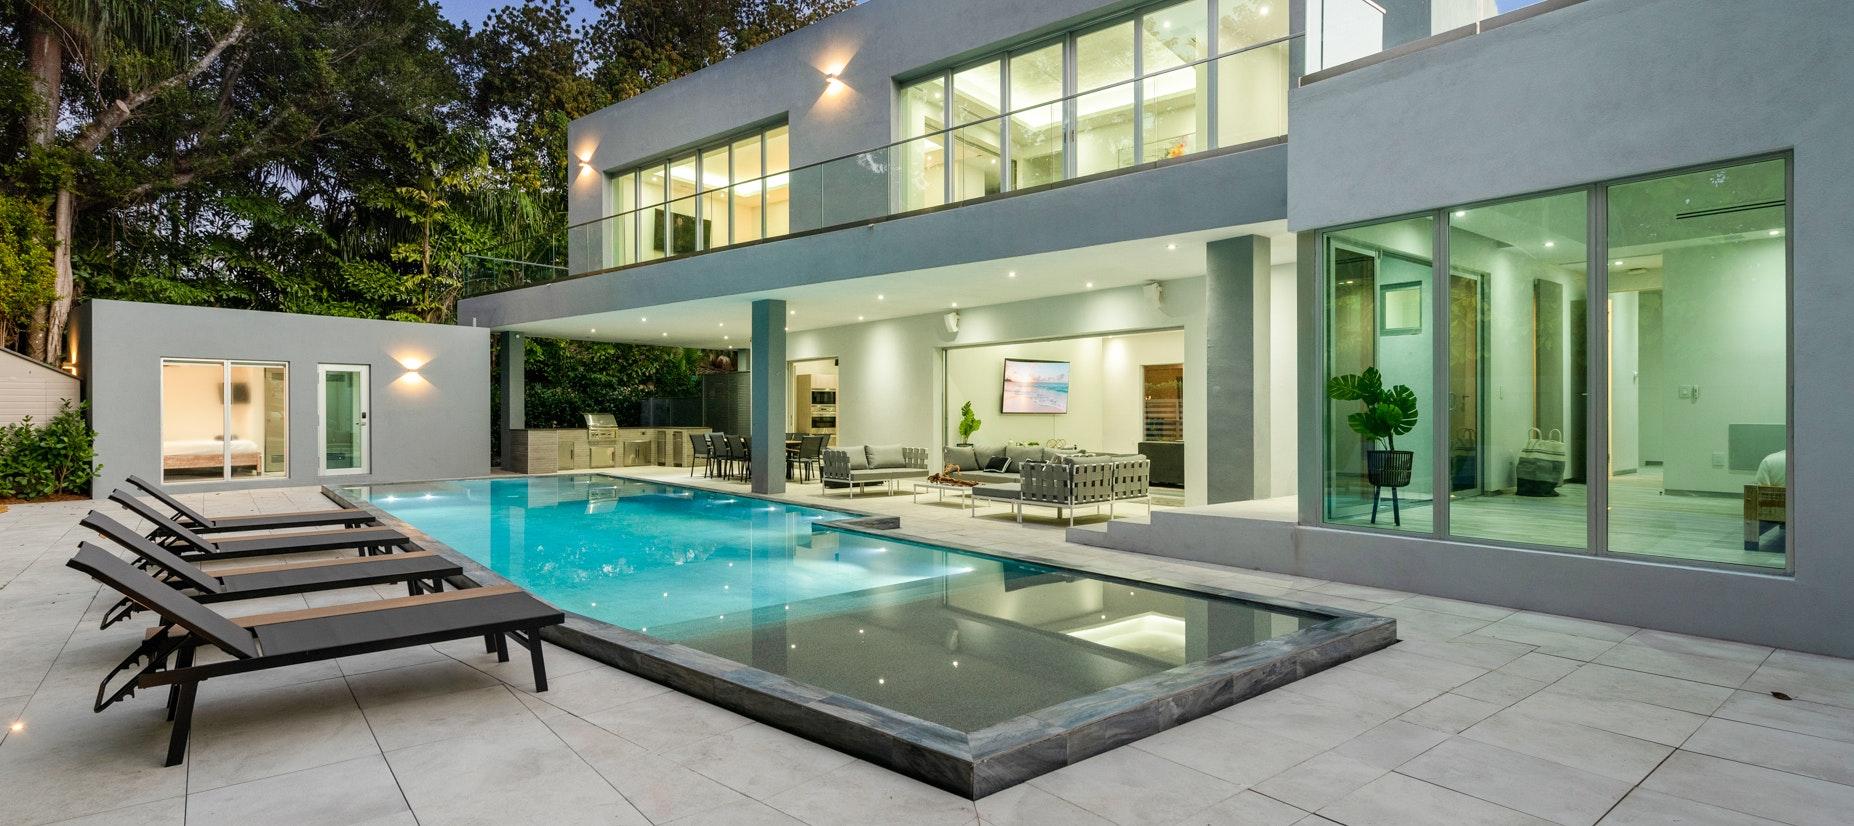 Villa Ciana luxury rental in Coconut Grove